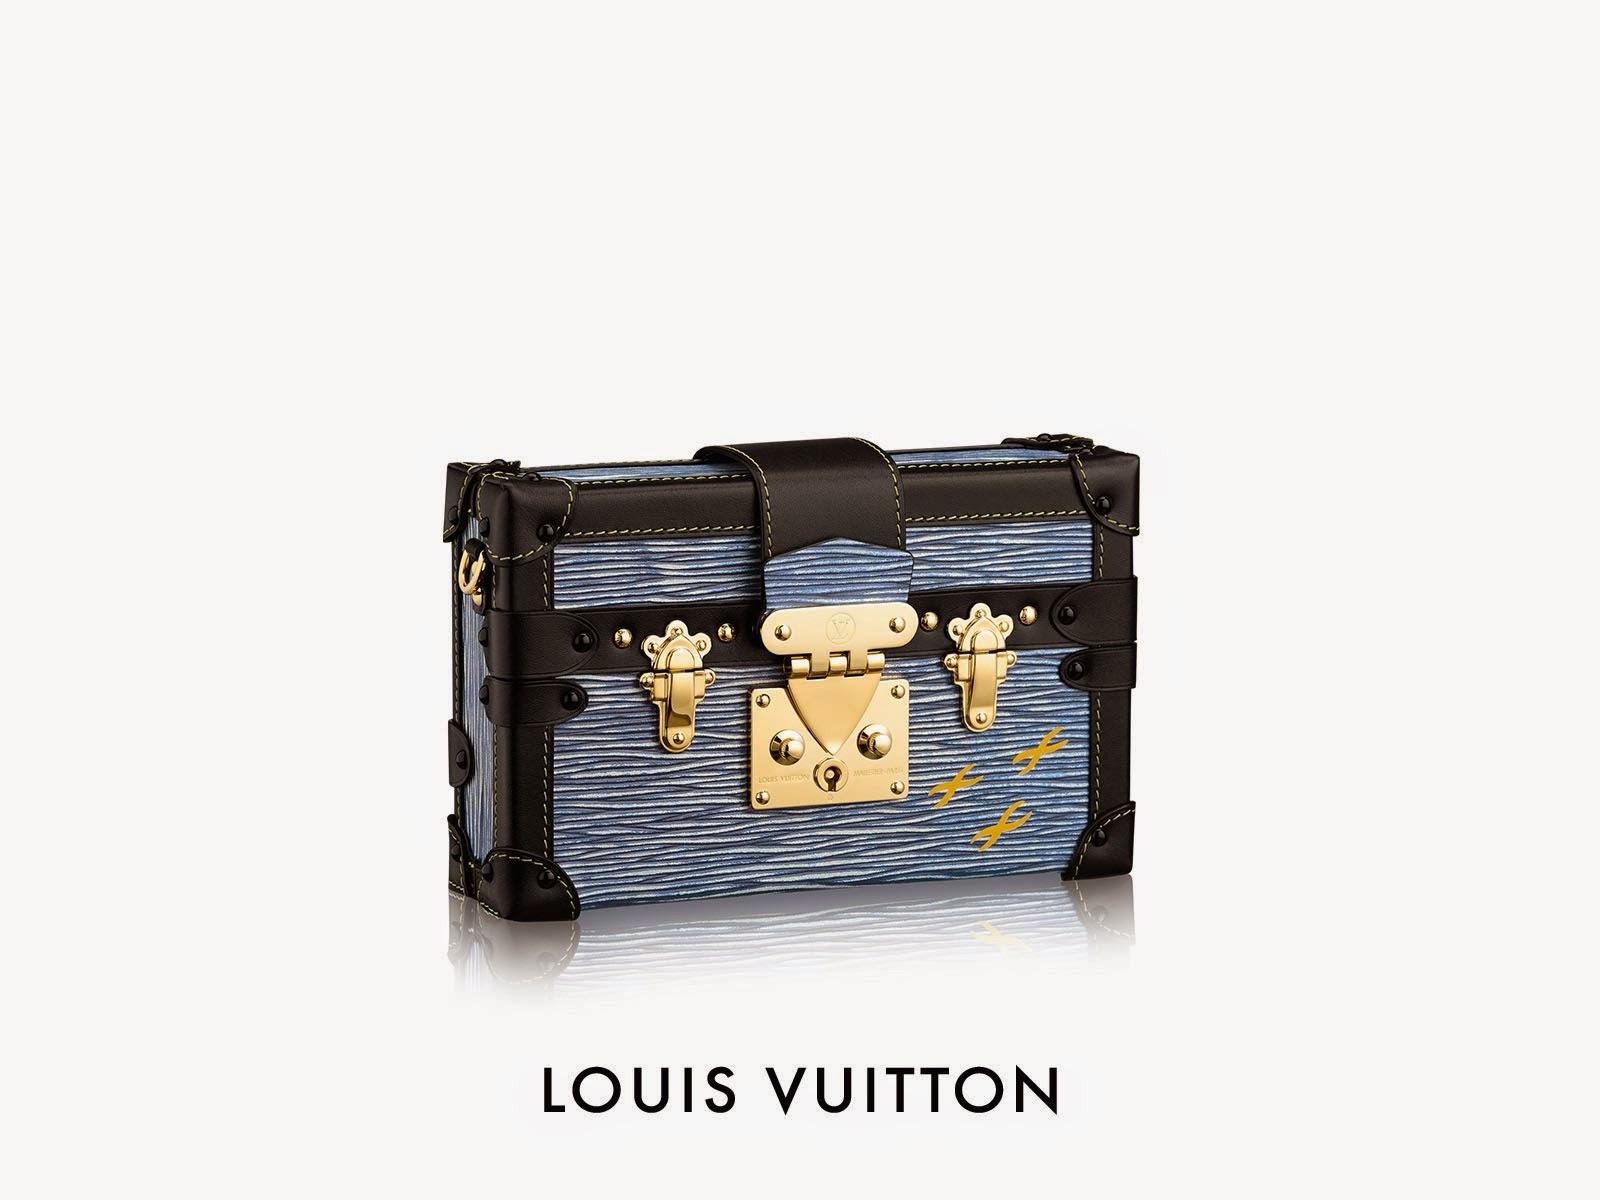 black prada handbag leather - authentic prada handbags outlet uk